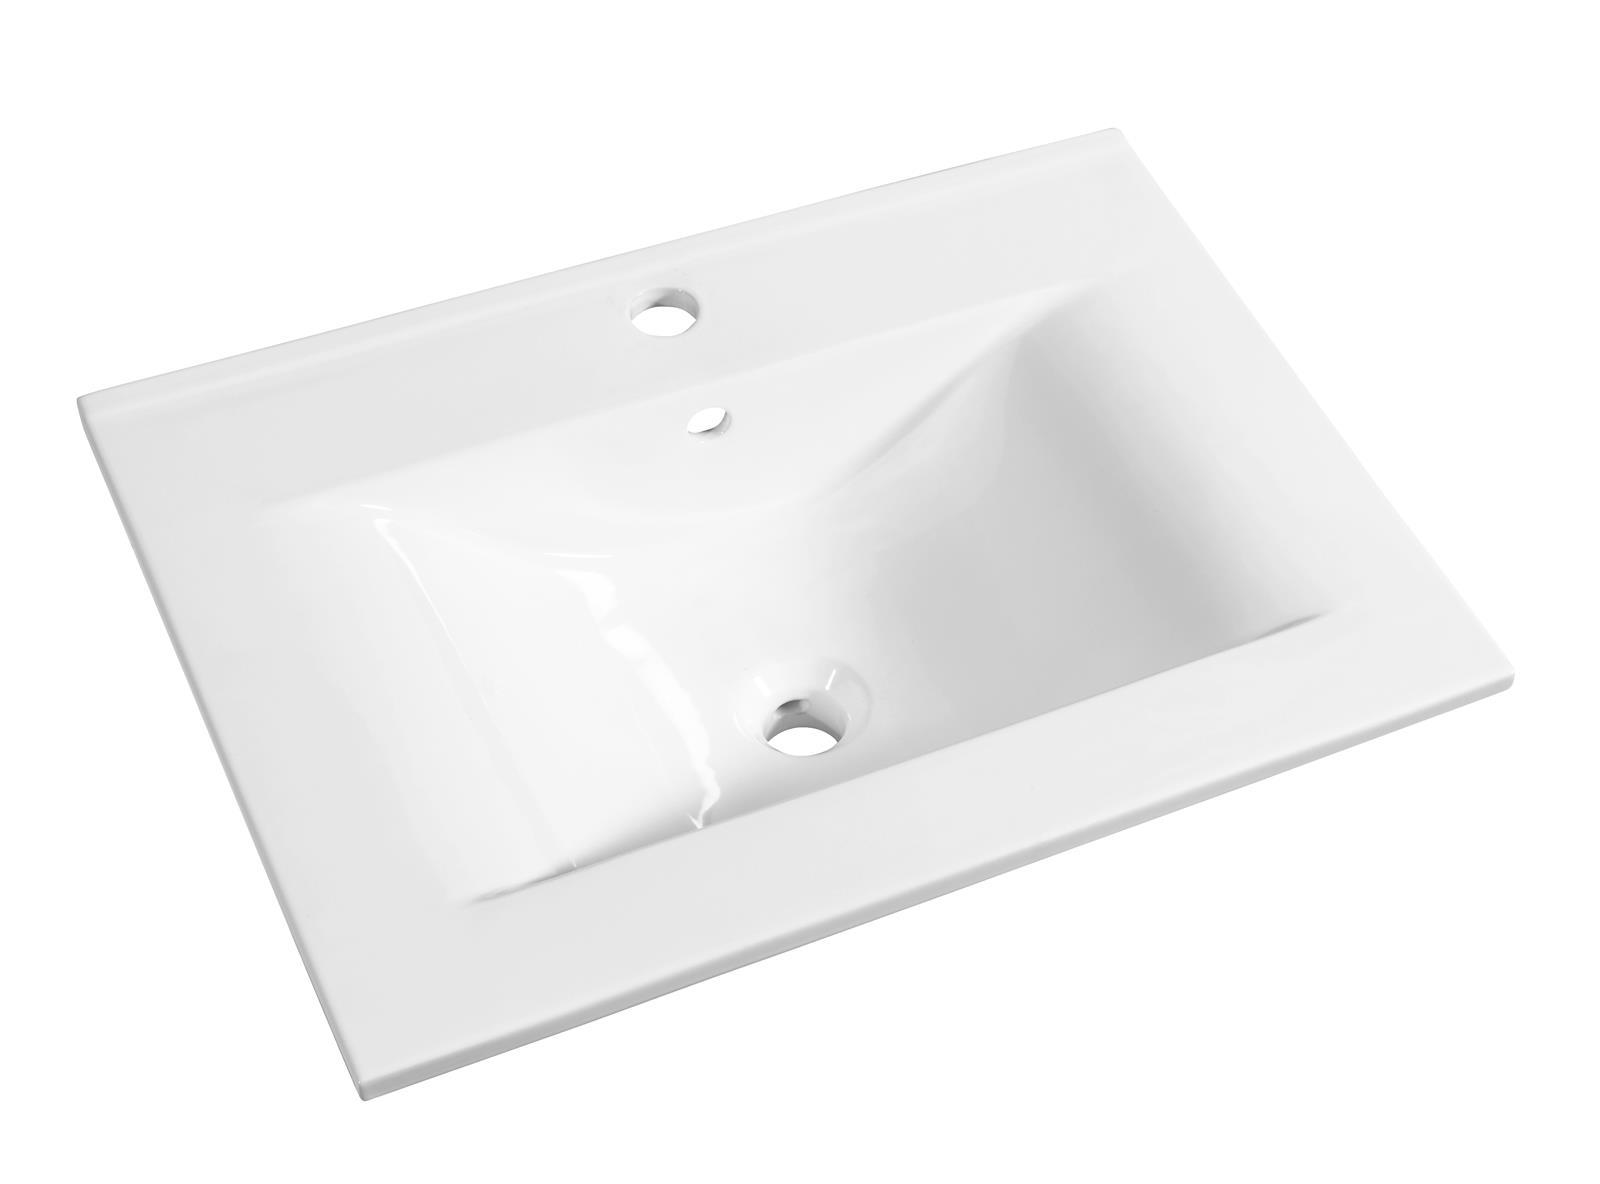 plan cramique soft srie adesio 3 sanitaire distribution - 100 Cm Plan Vasque